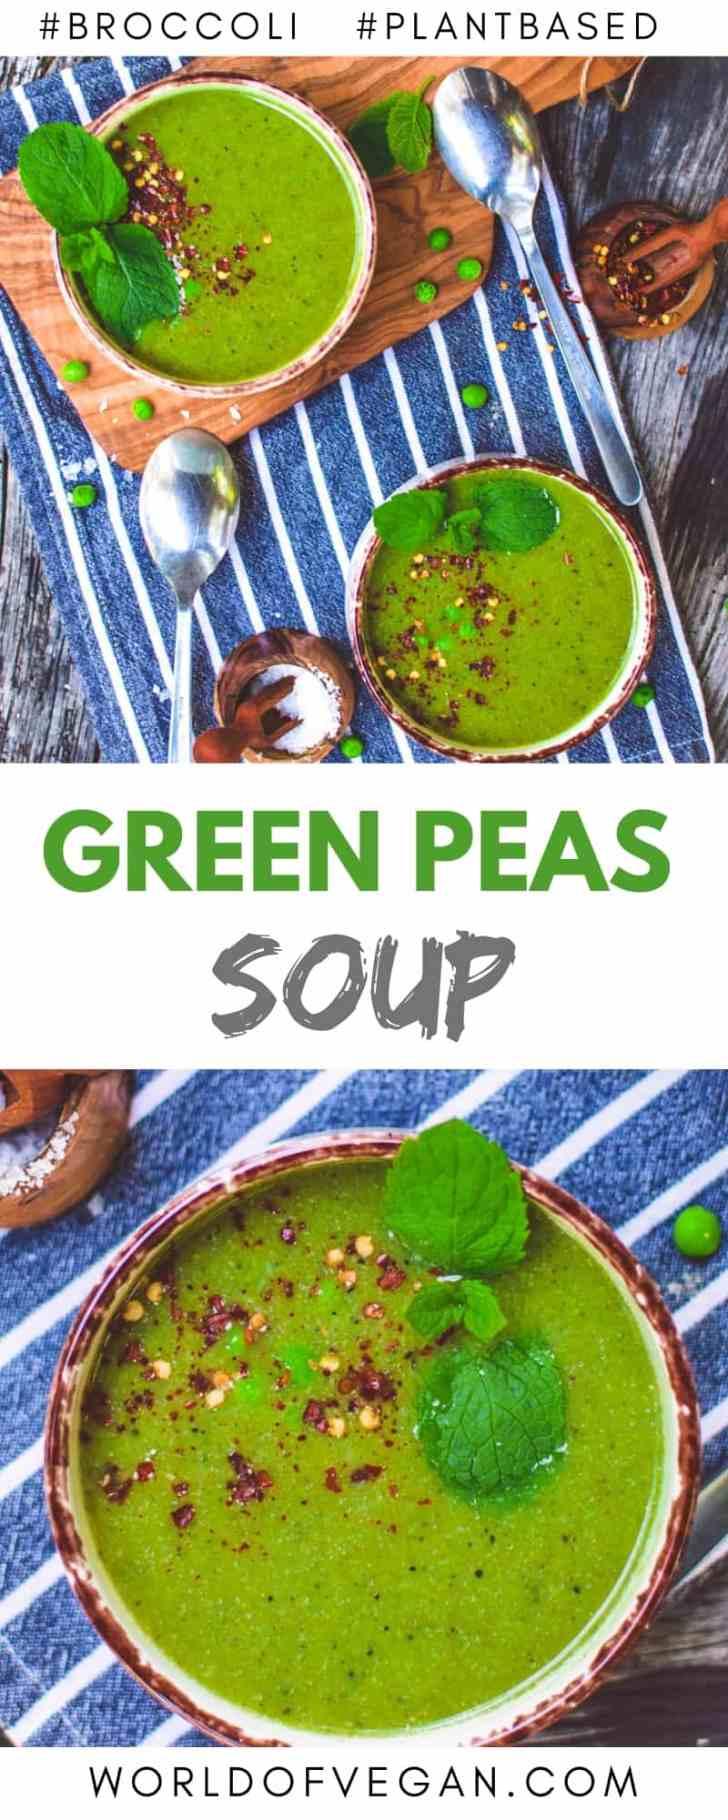 Pea & Broccoli Soup Recipe | Super-Easy Vegan Dinner | #peas #broccoli #soup #winter #fall #worldofvegan